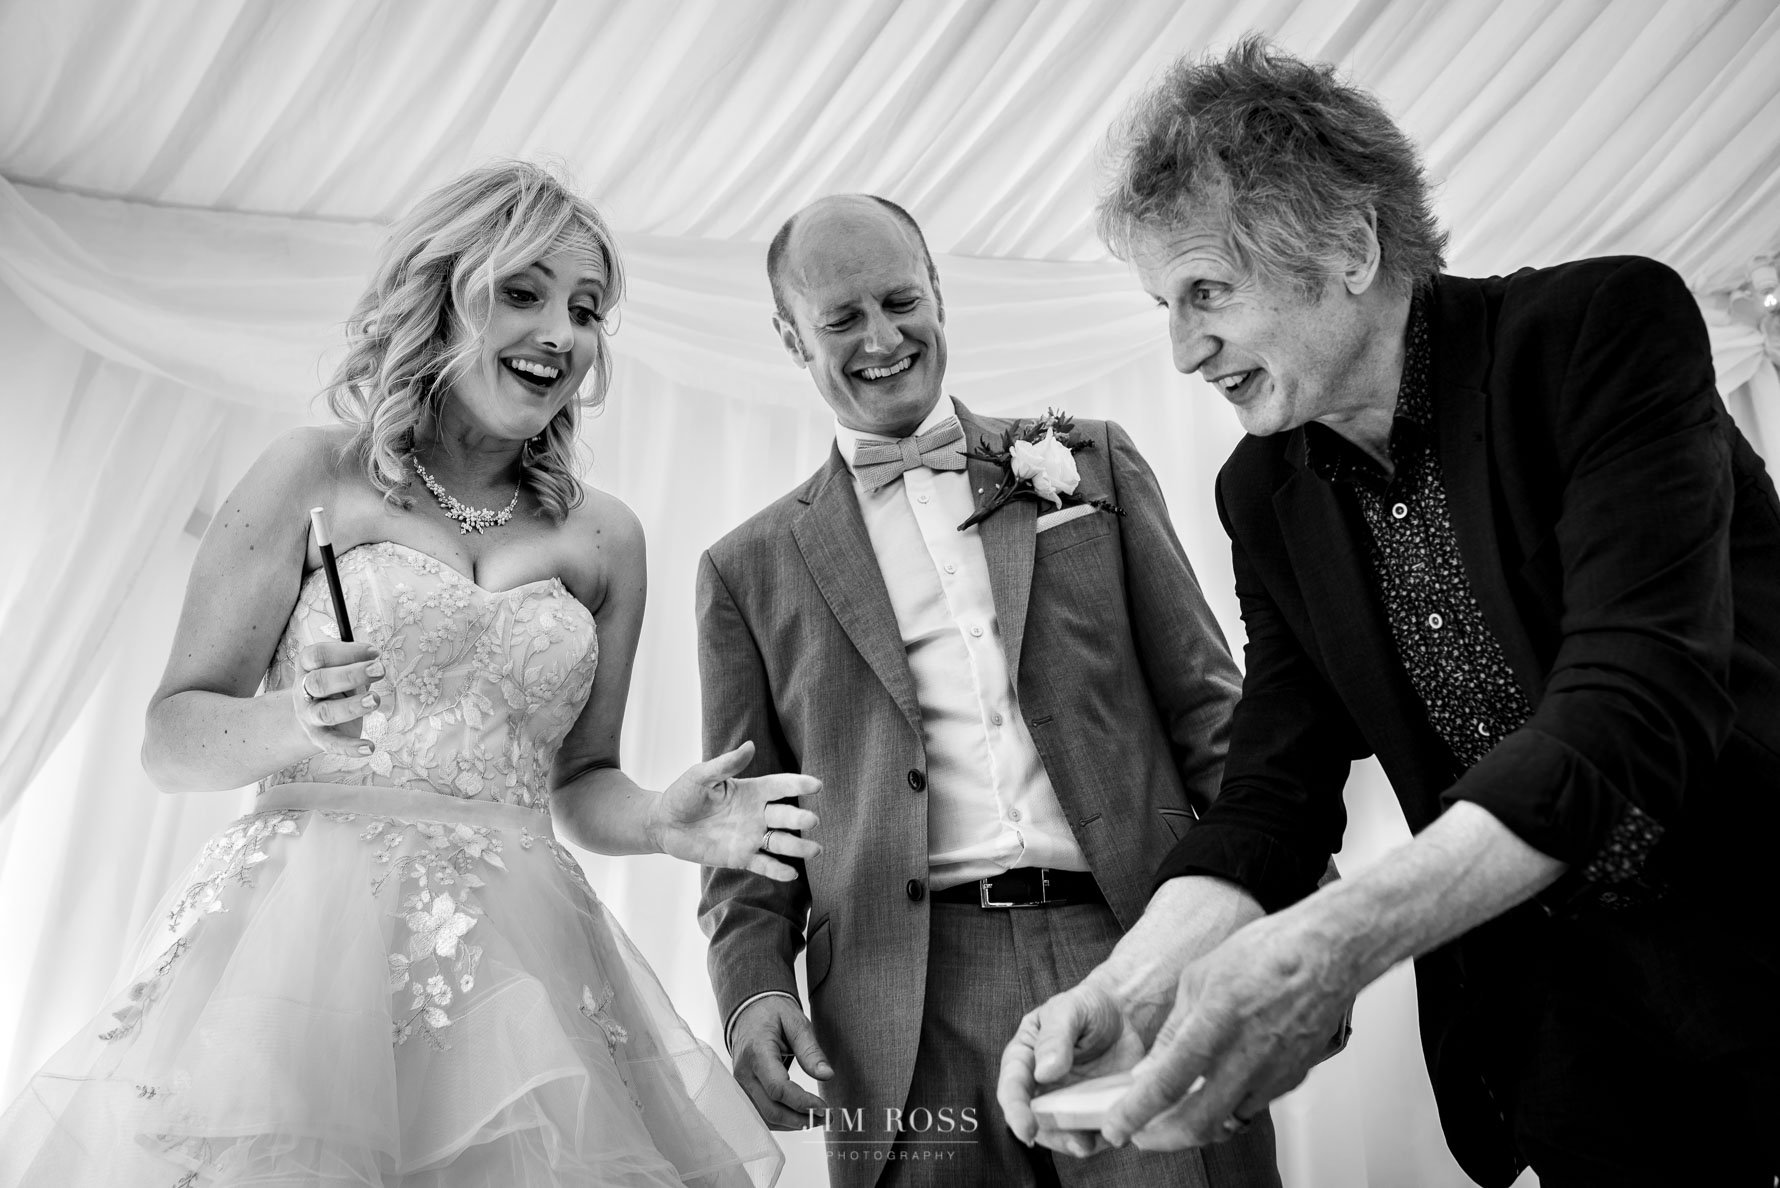 Magician wows newlyweds